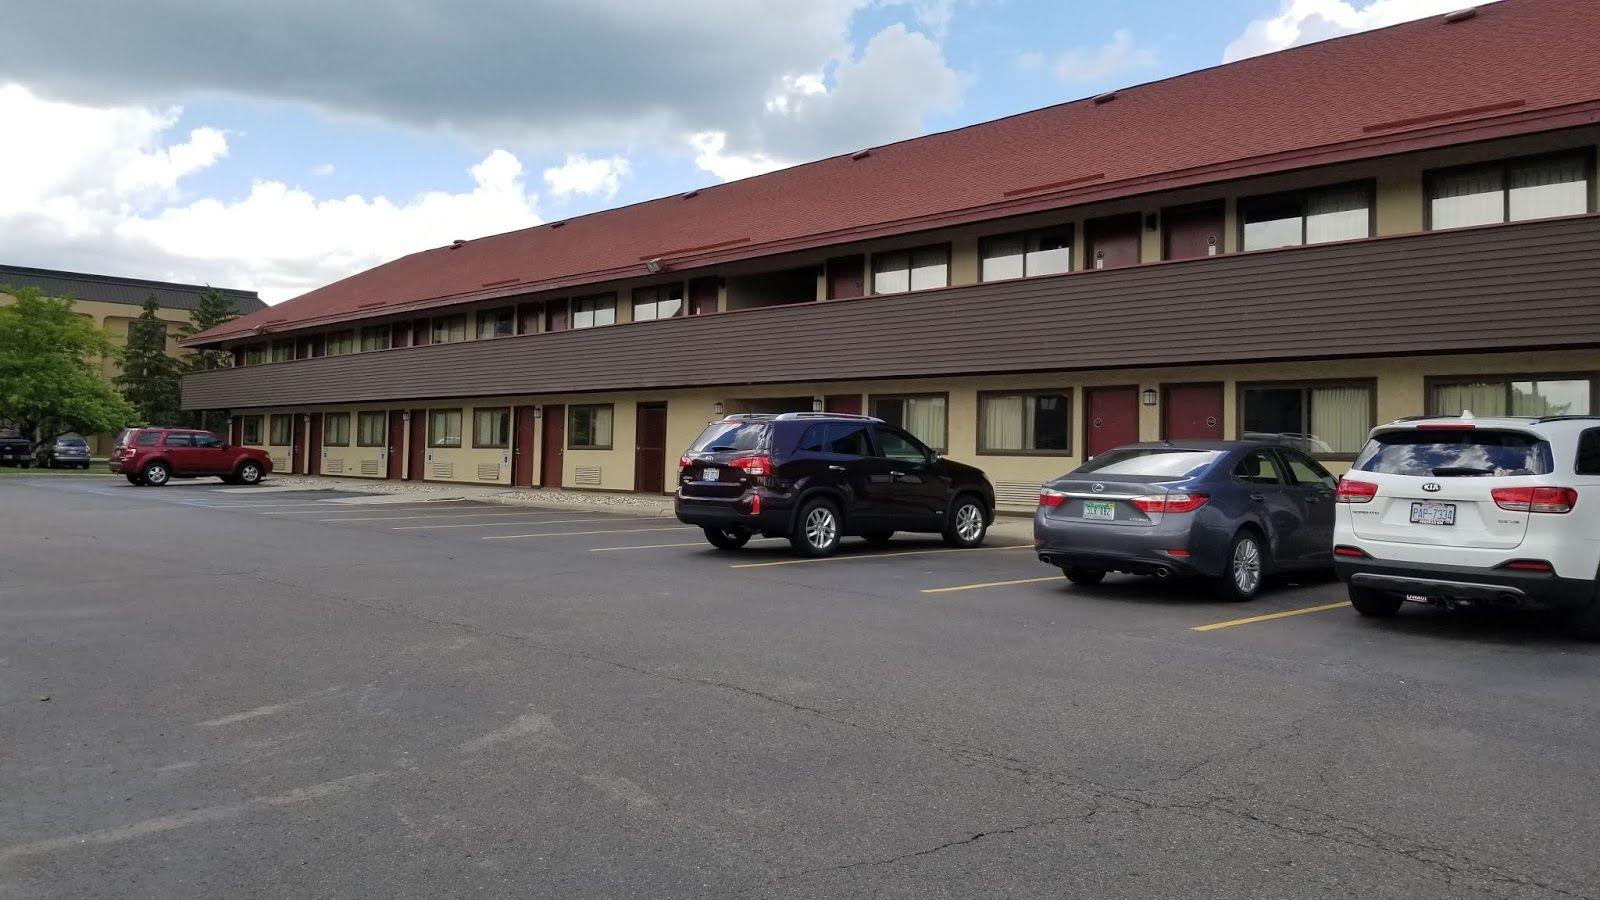 Hotel review Red Roof PLUS+ Ann Arbor, a convenient place